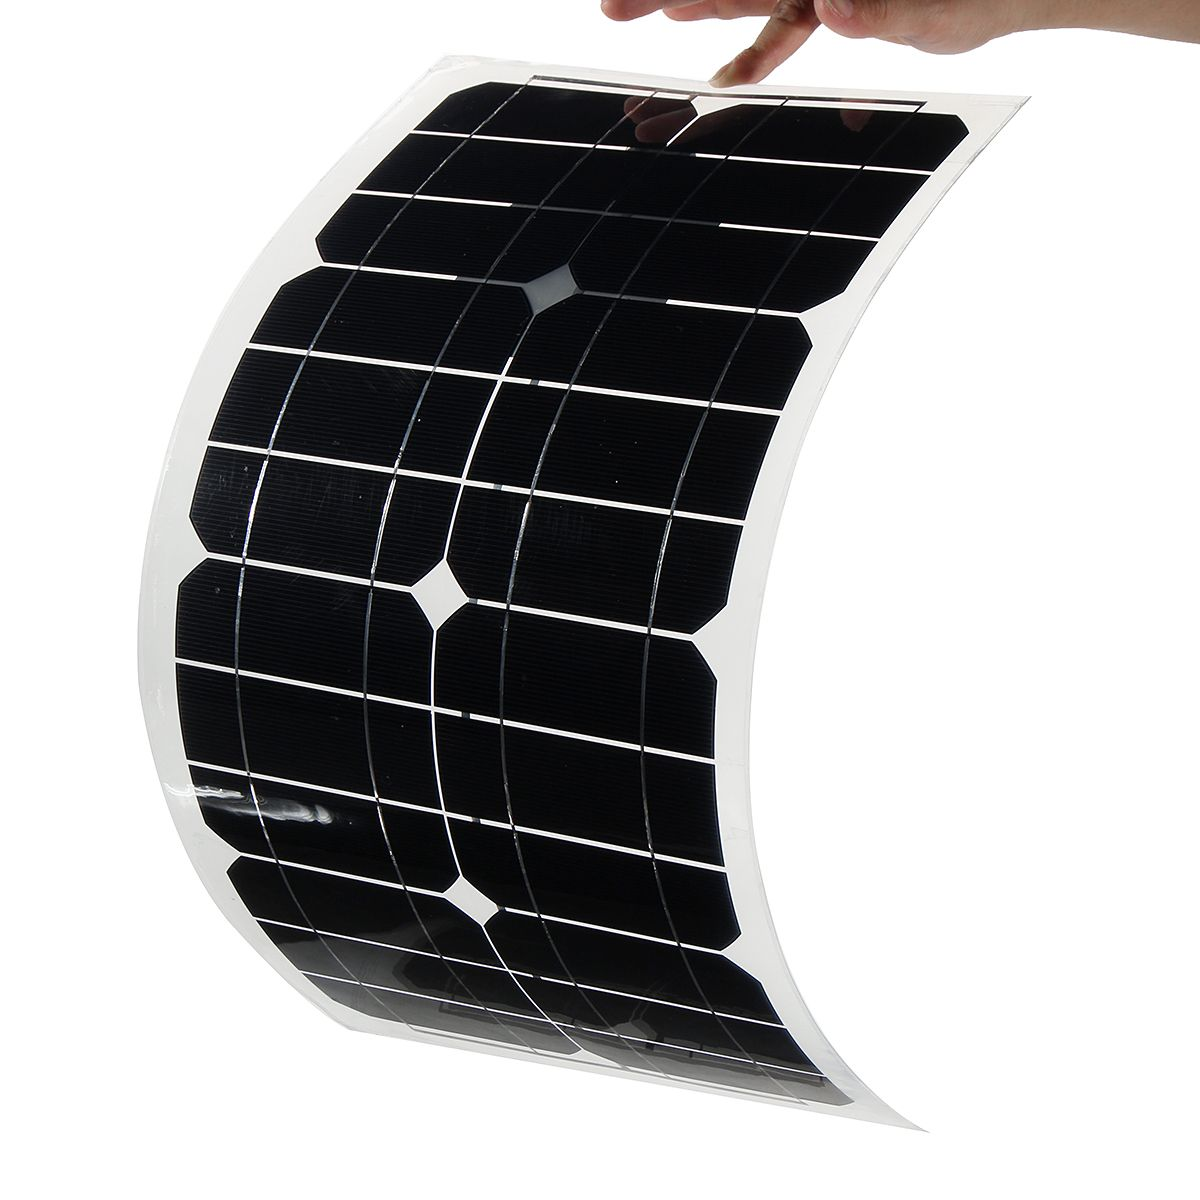 Scm Solar 24w 5v elfeland semi a class sun power usb solar panel for